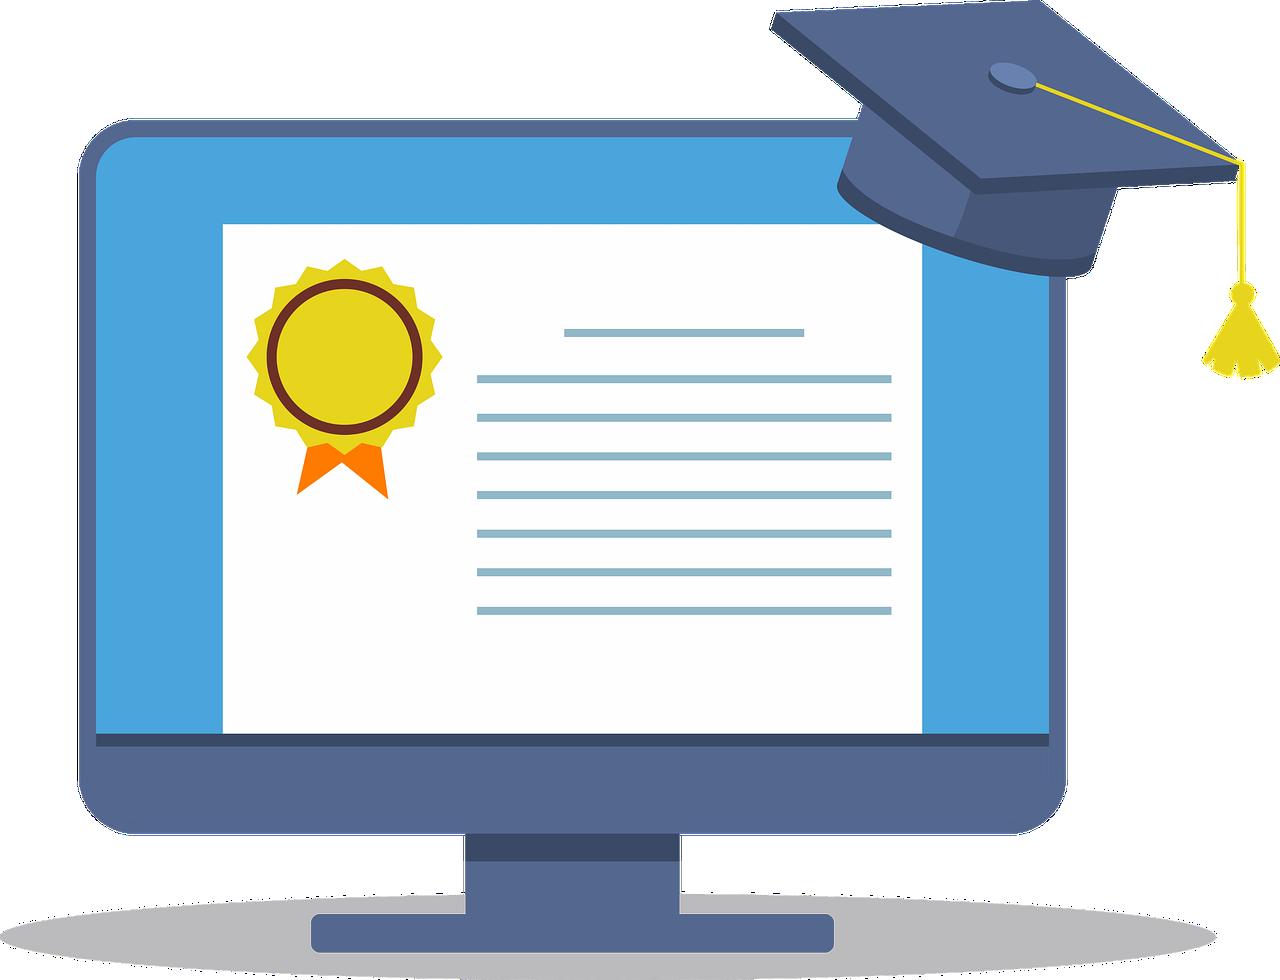 Education Online School Elearning  - ArtsyBee / Pixabay